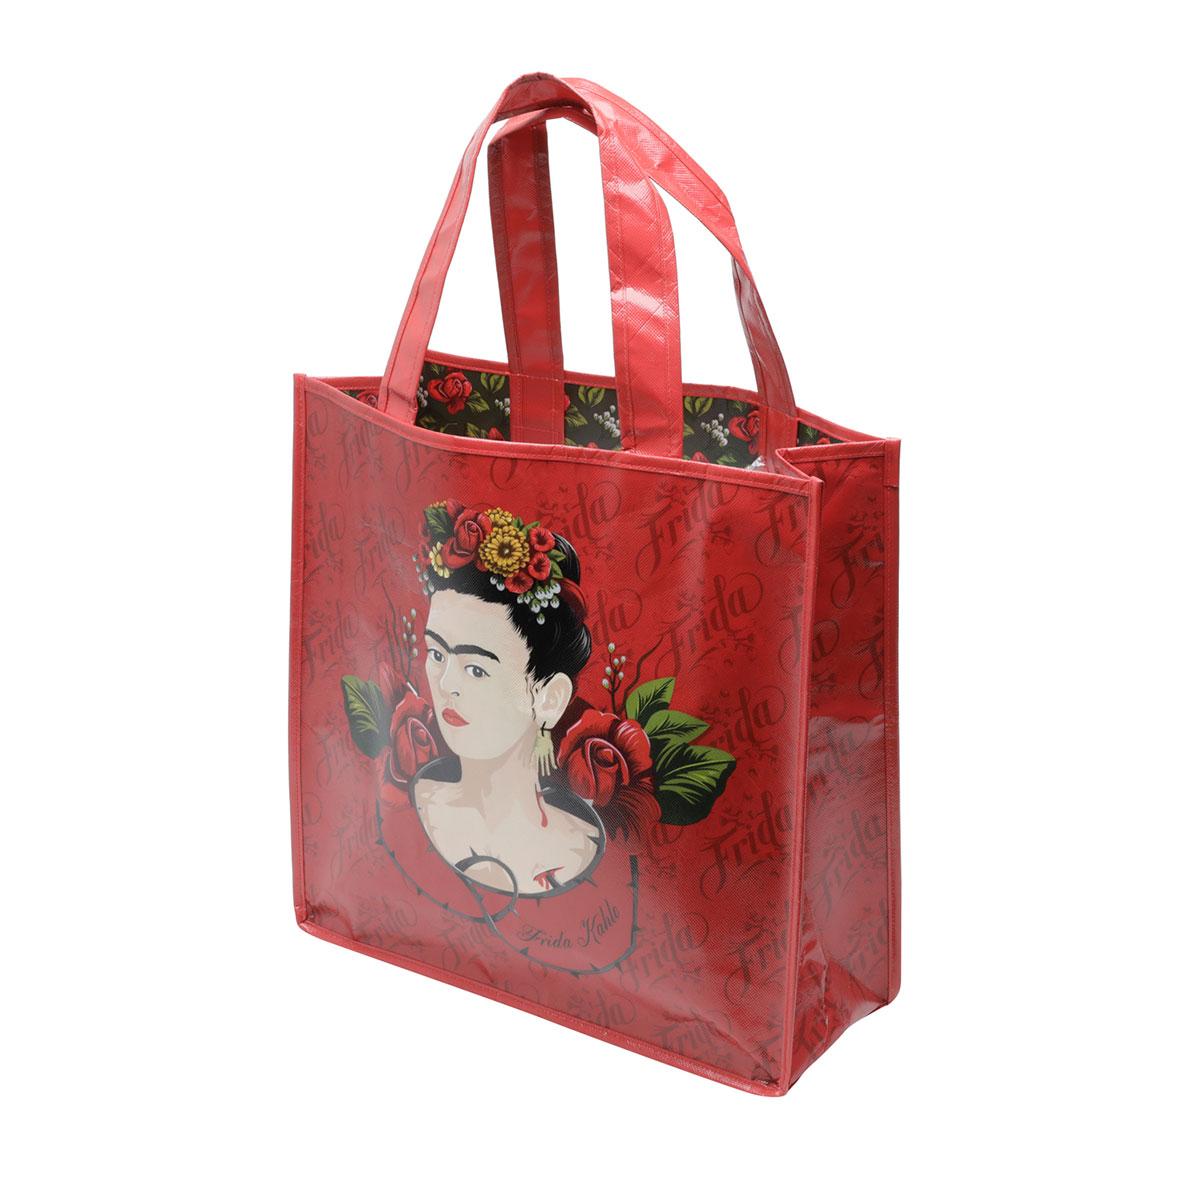 Sacola Reutilizável Frida Kahlo Red Roses - Presente Super